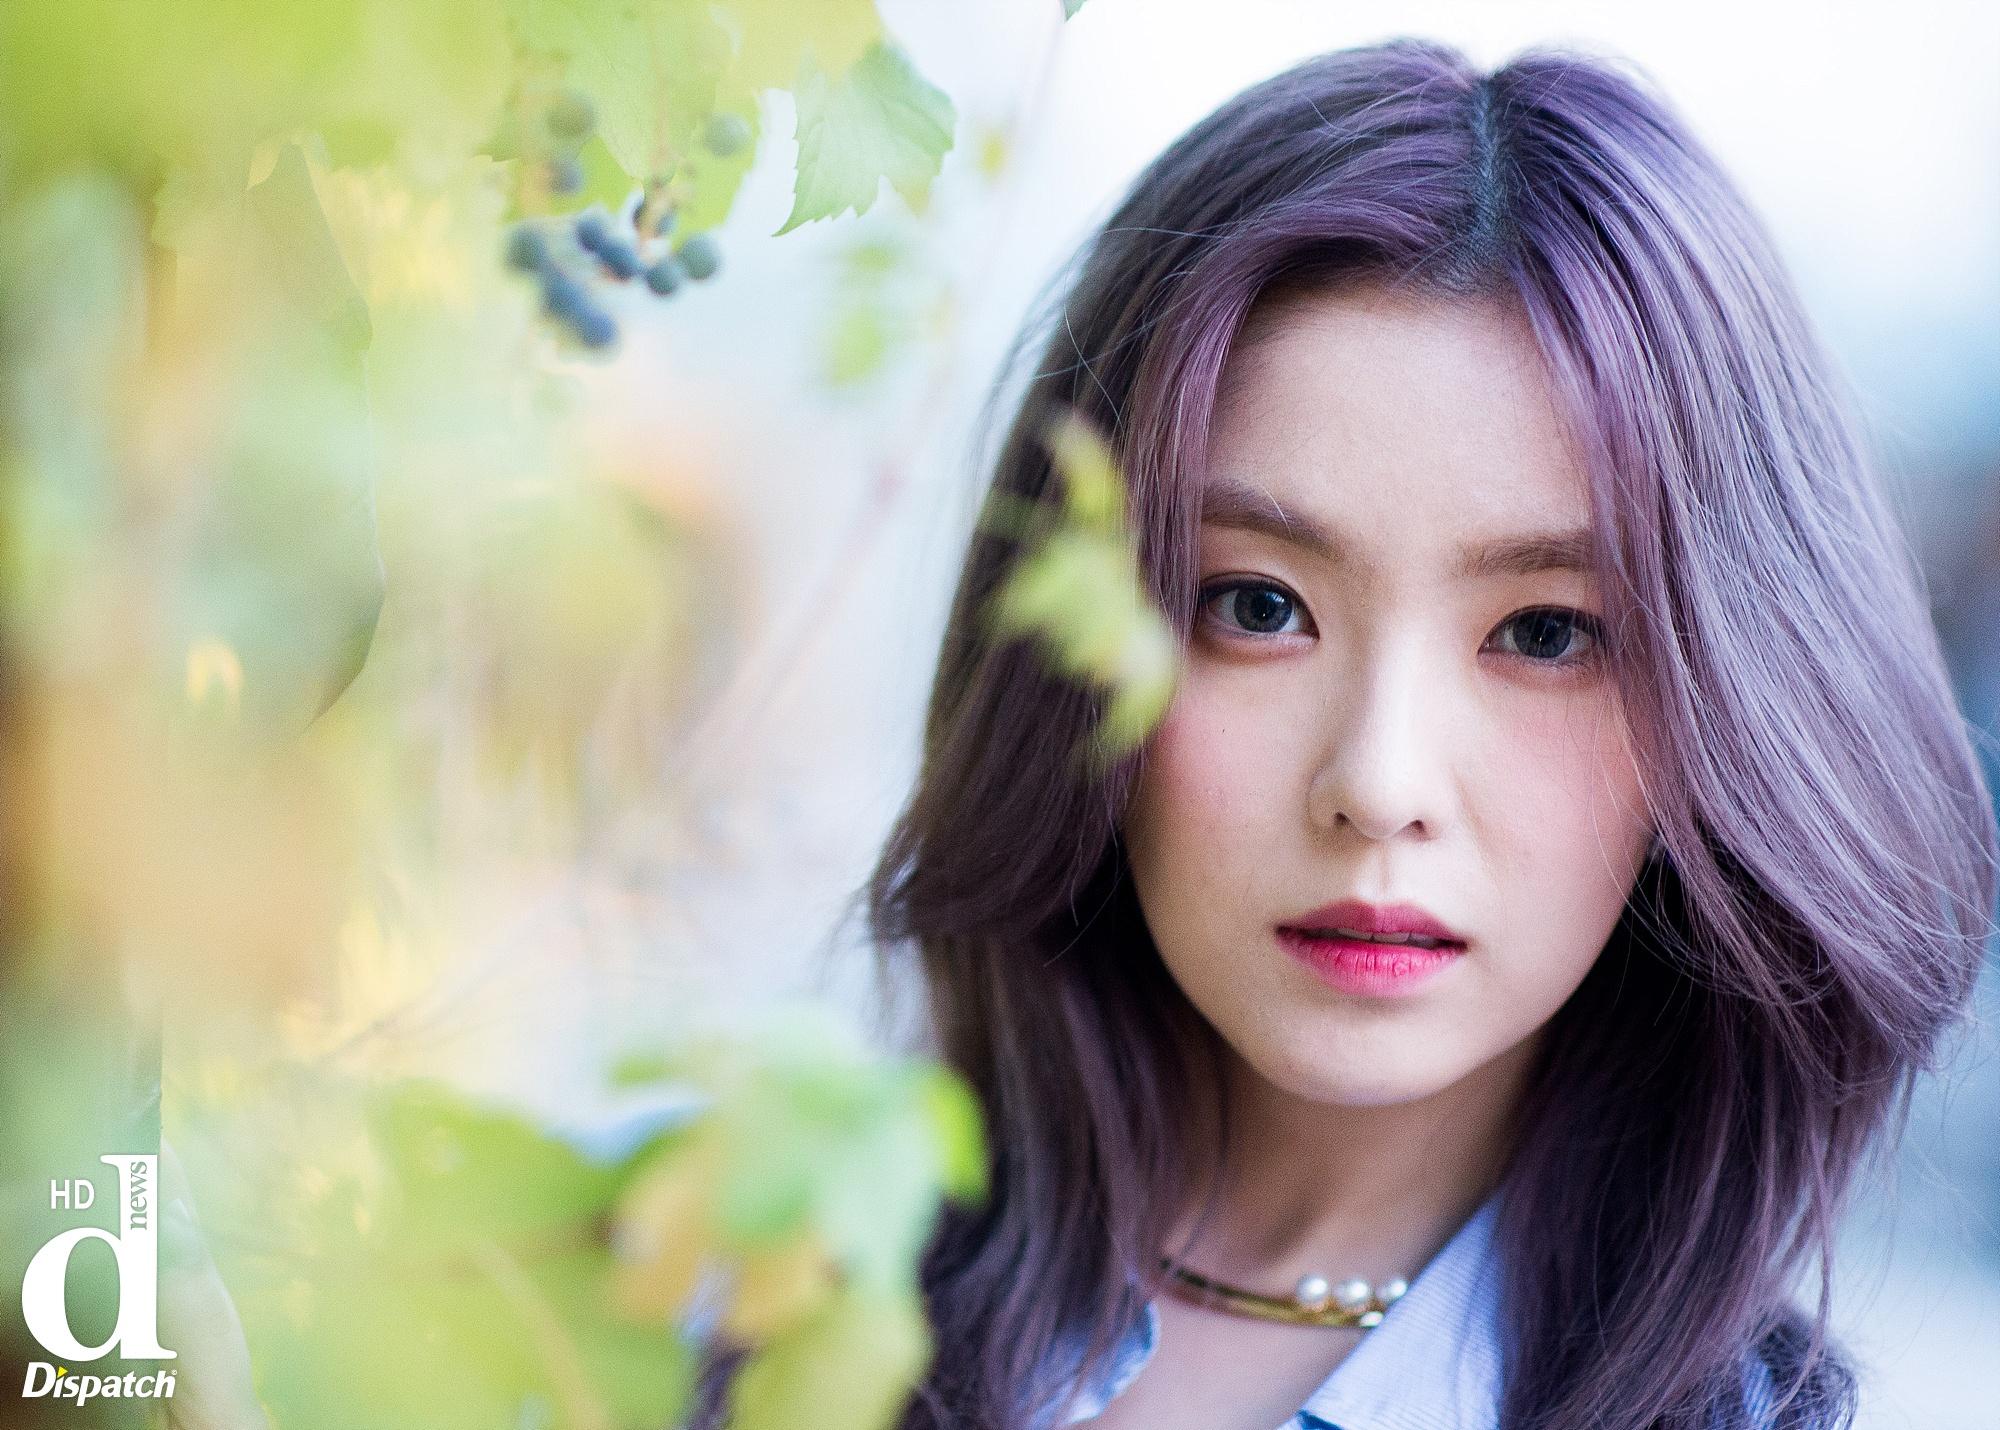 Irene Reveals The Secret To Her Signature Eye Makeup